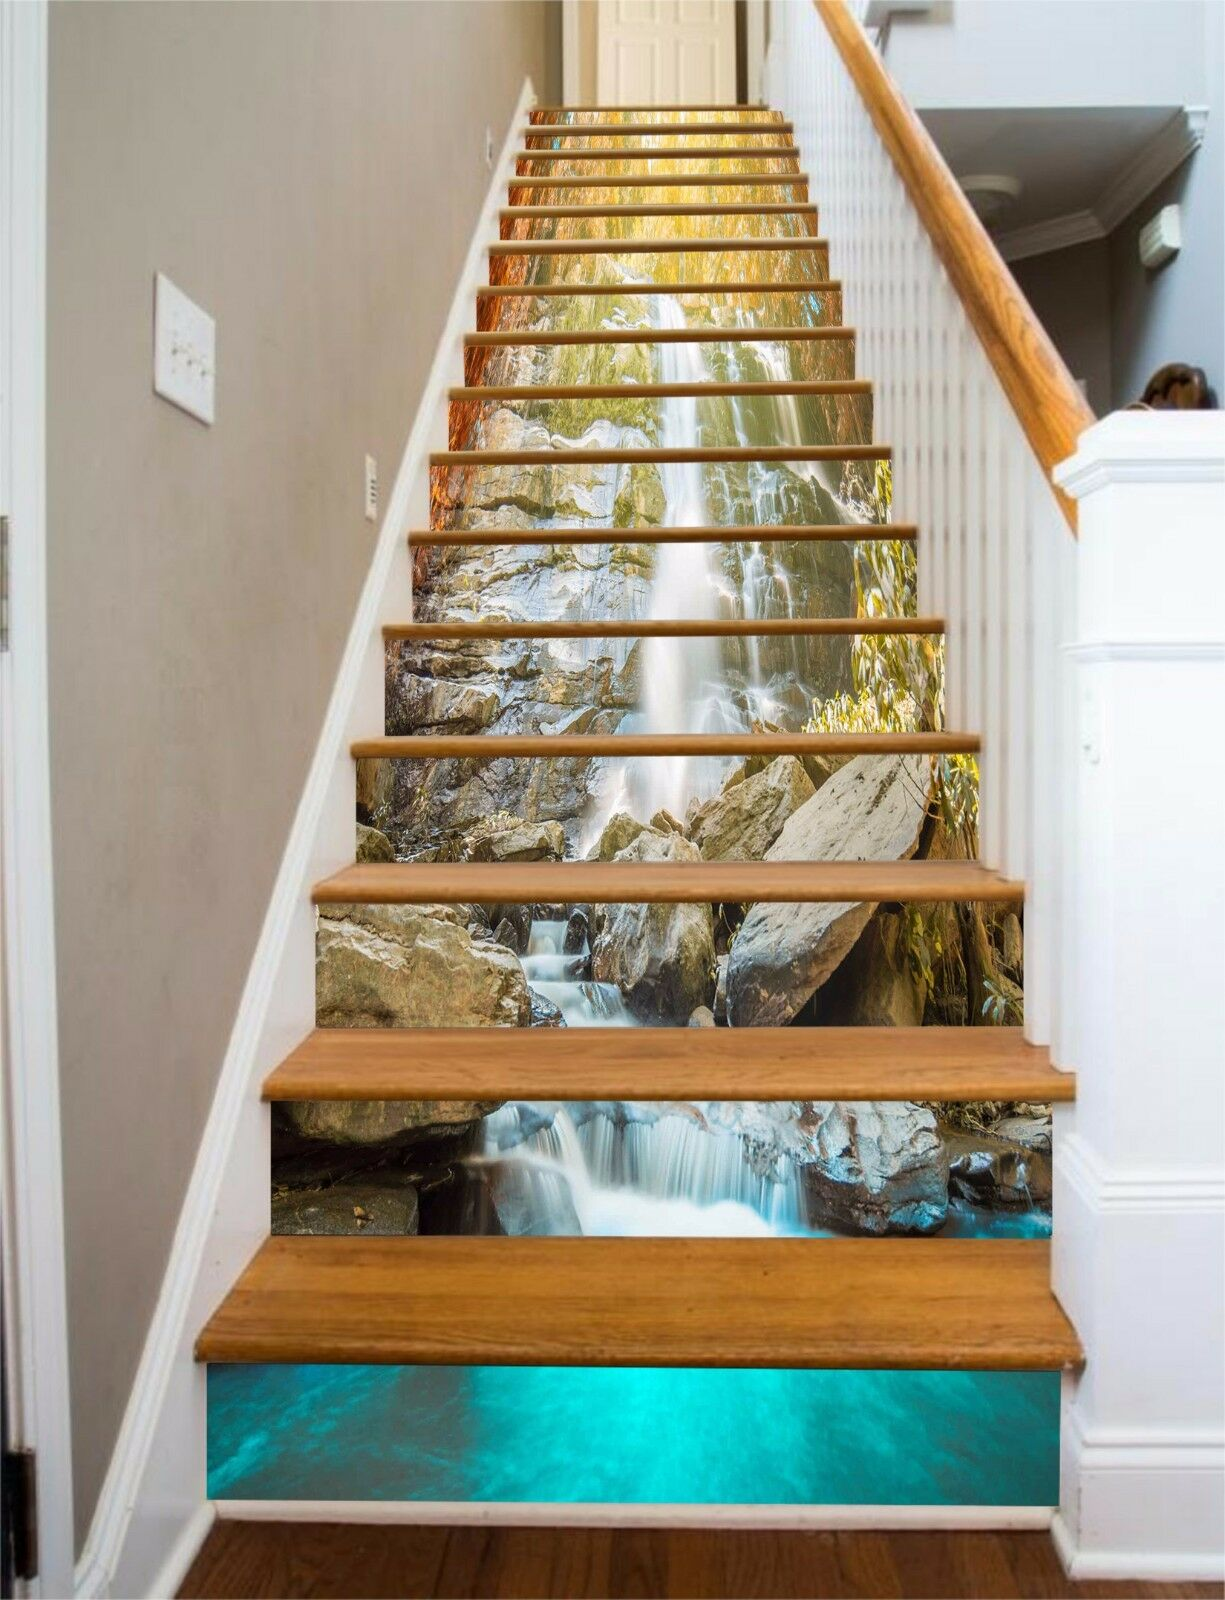 3D Stone brook 117 Stair Risers Decoration Photo Mural Vinyl Decal Wallpaper UK